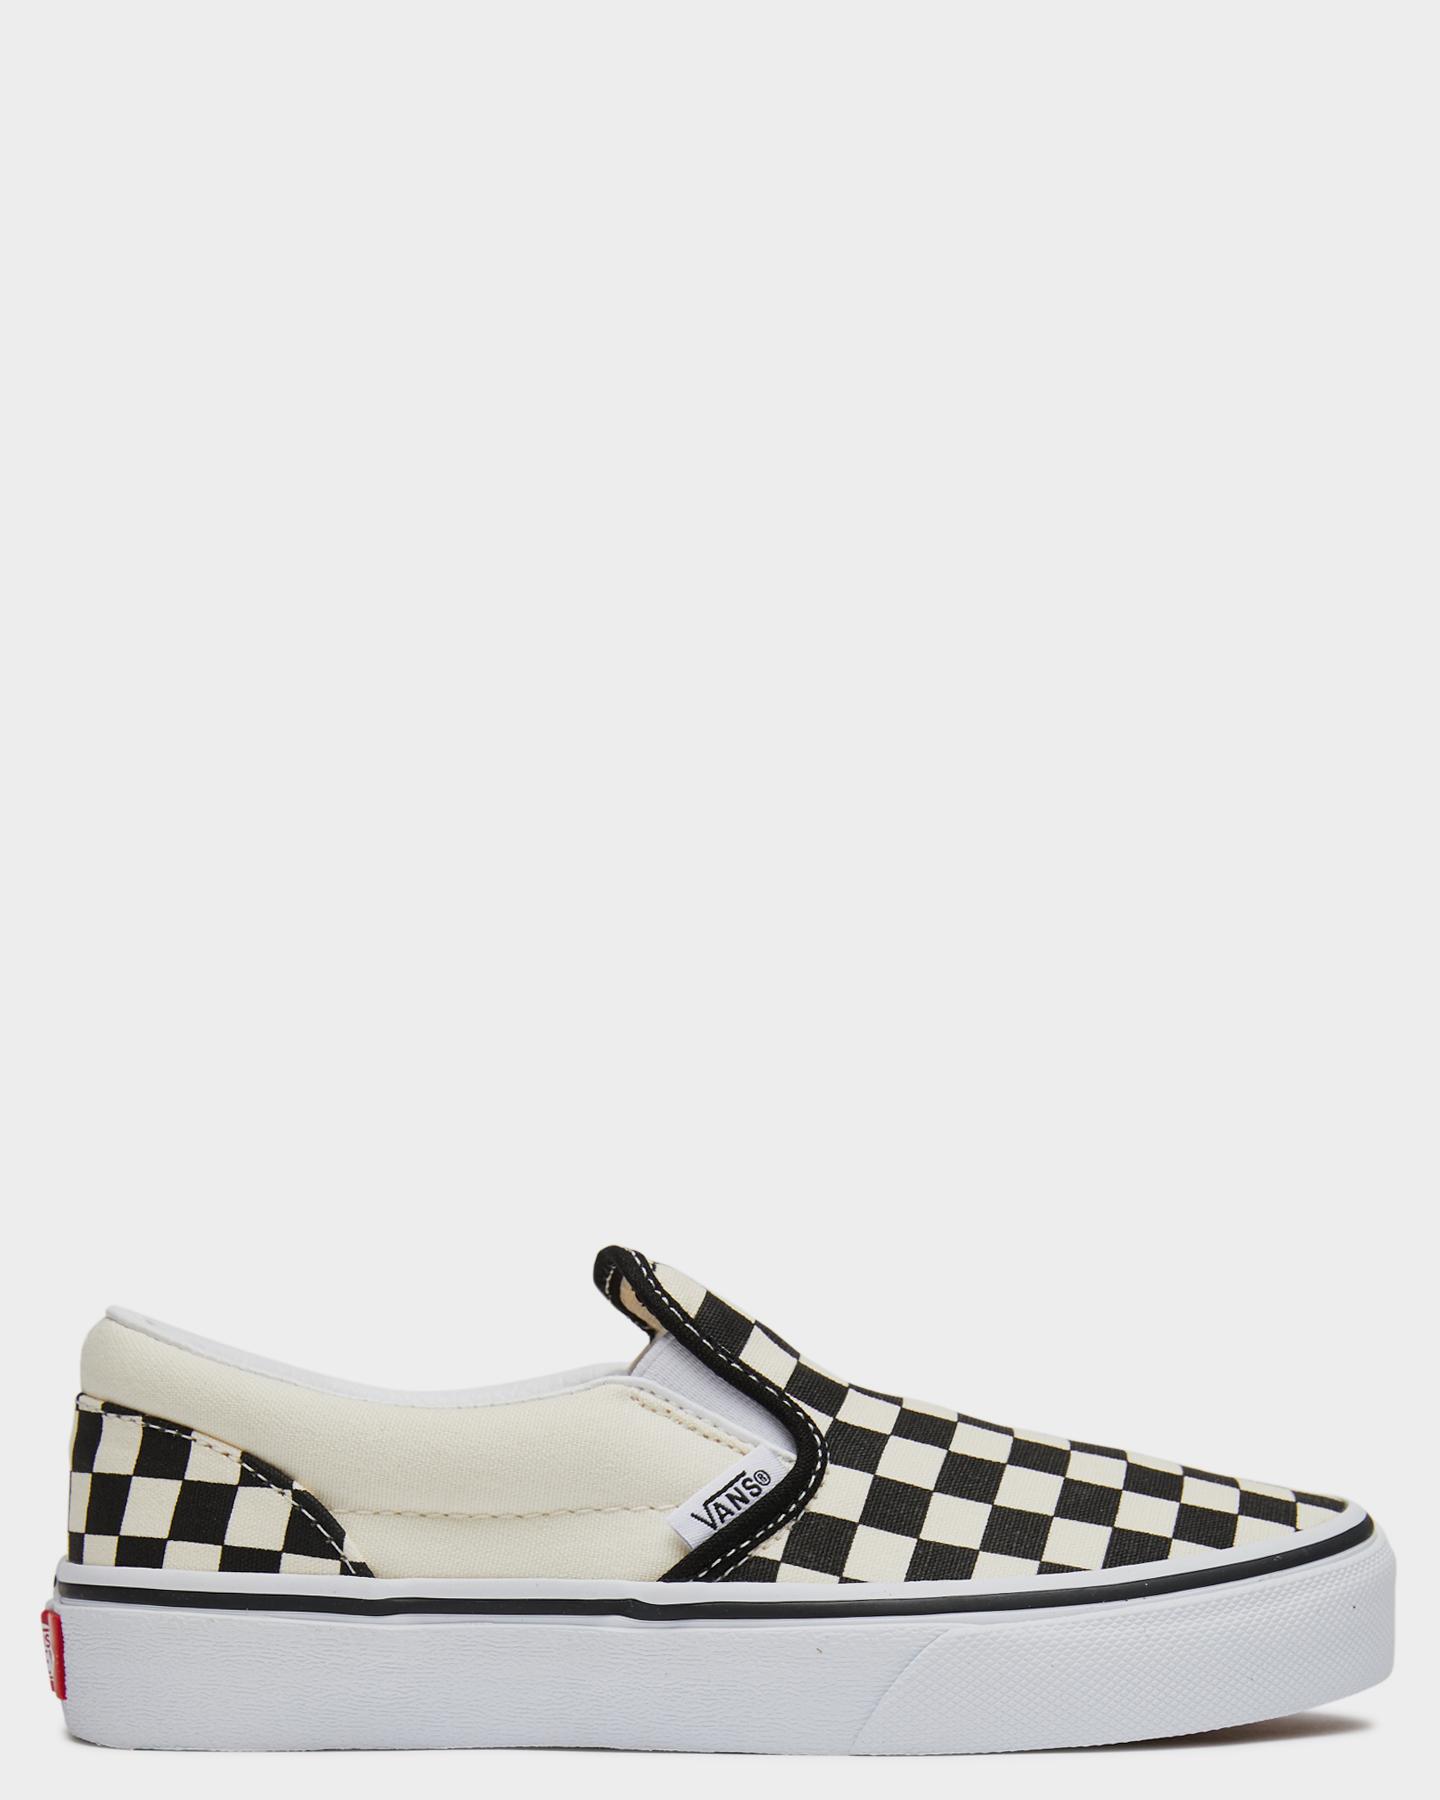 Vans Classic Slip On Shoe - Youth Black